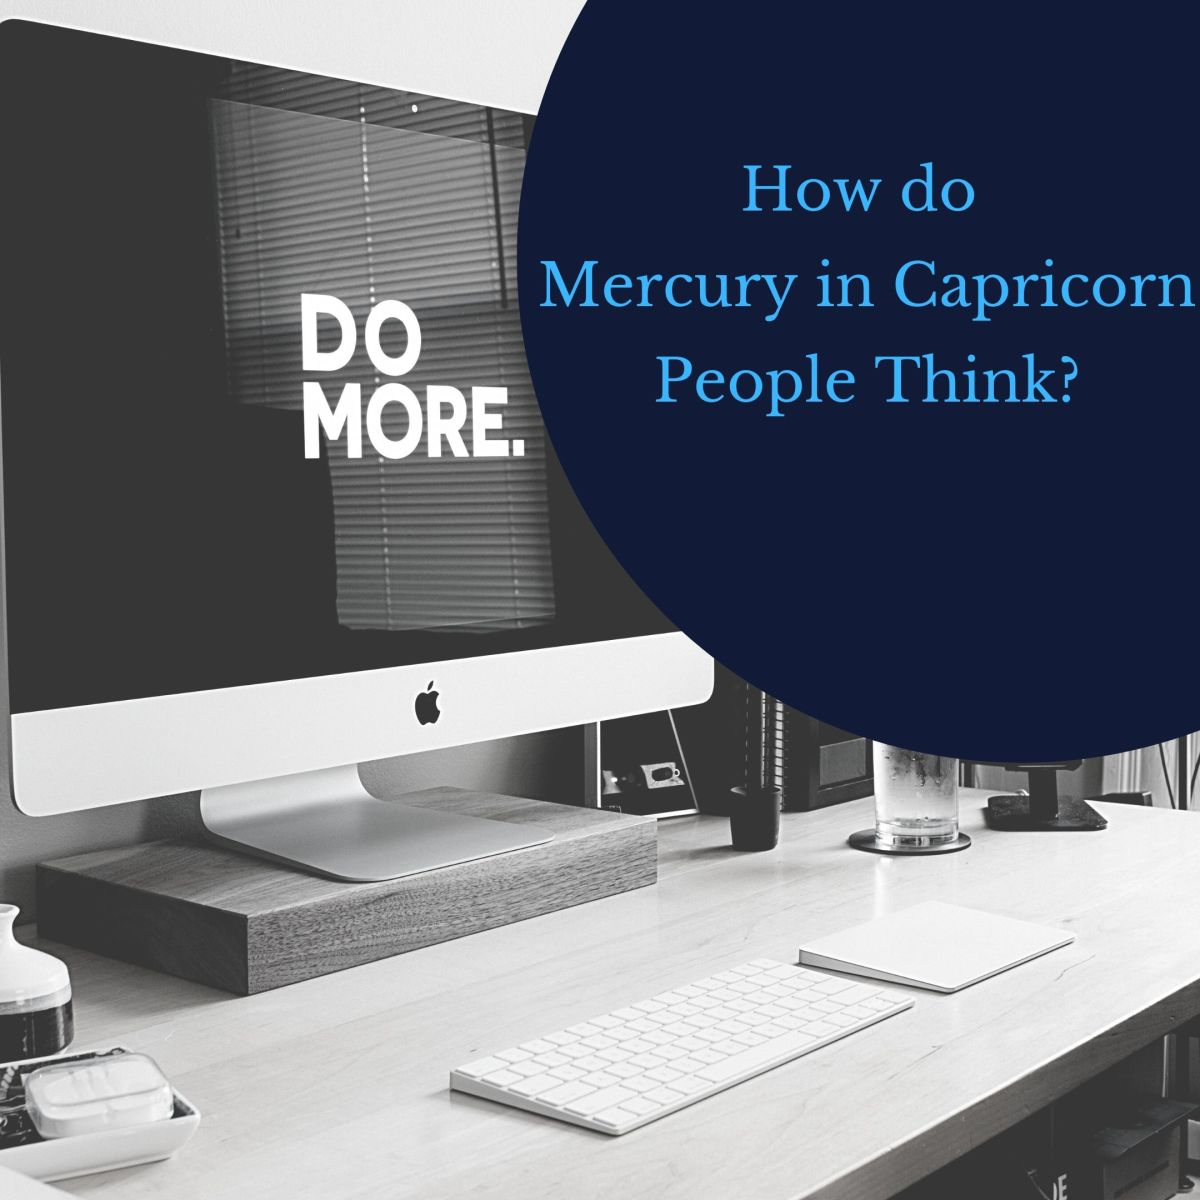 Mercury in Capricorn Thinkers